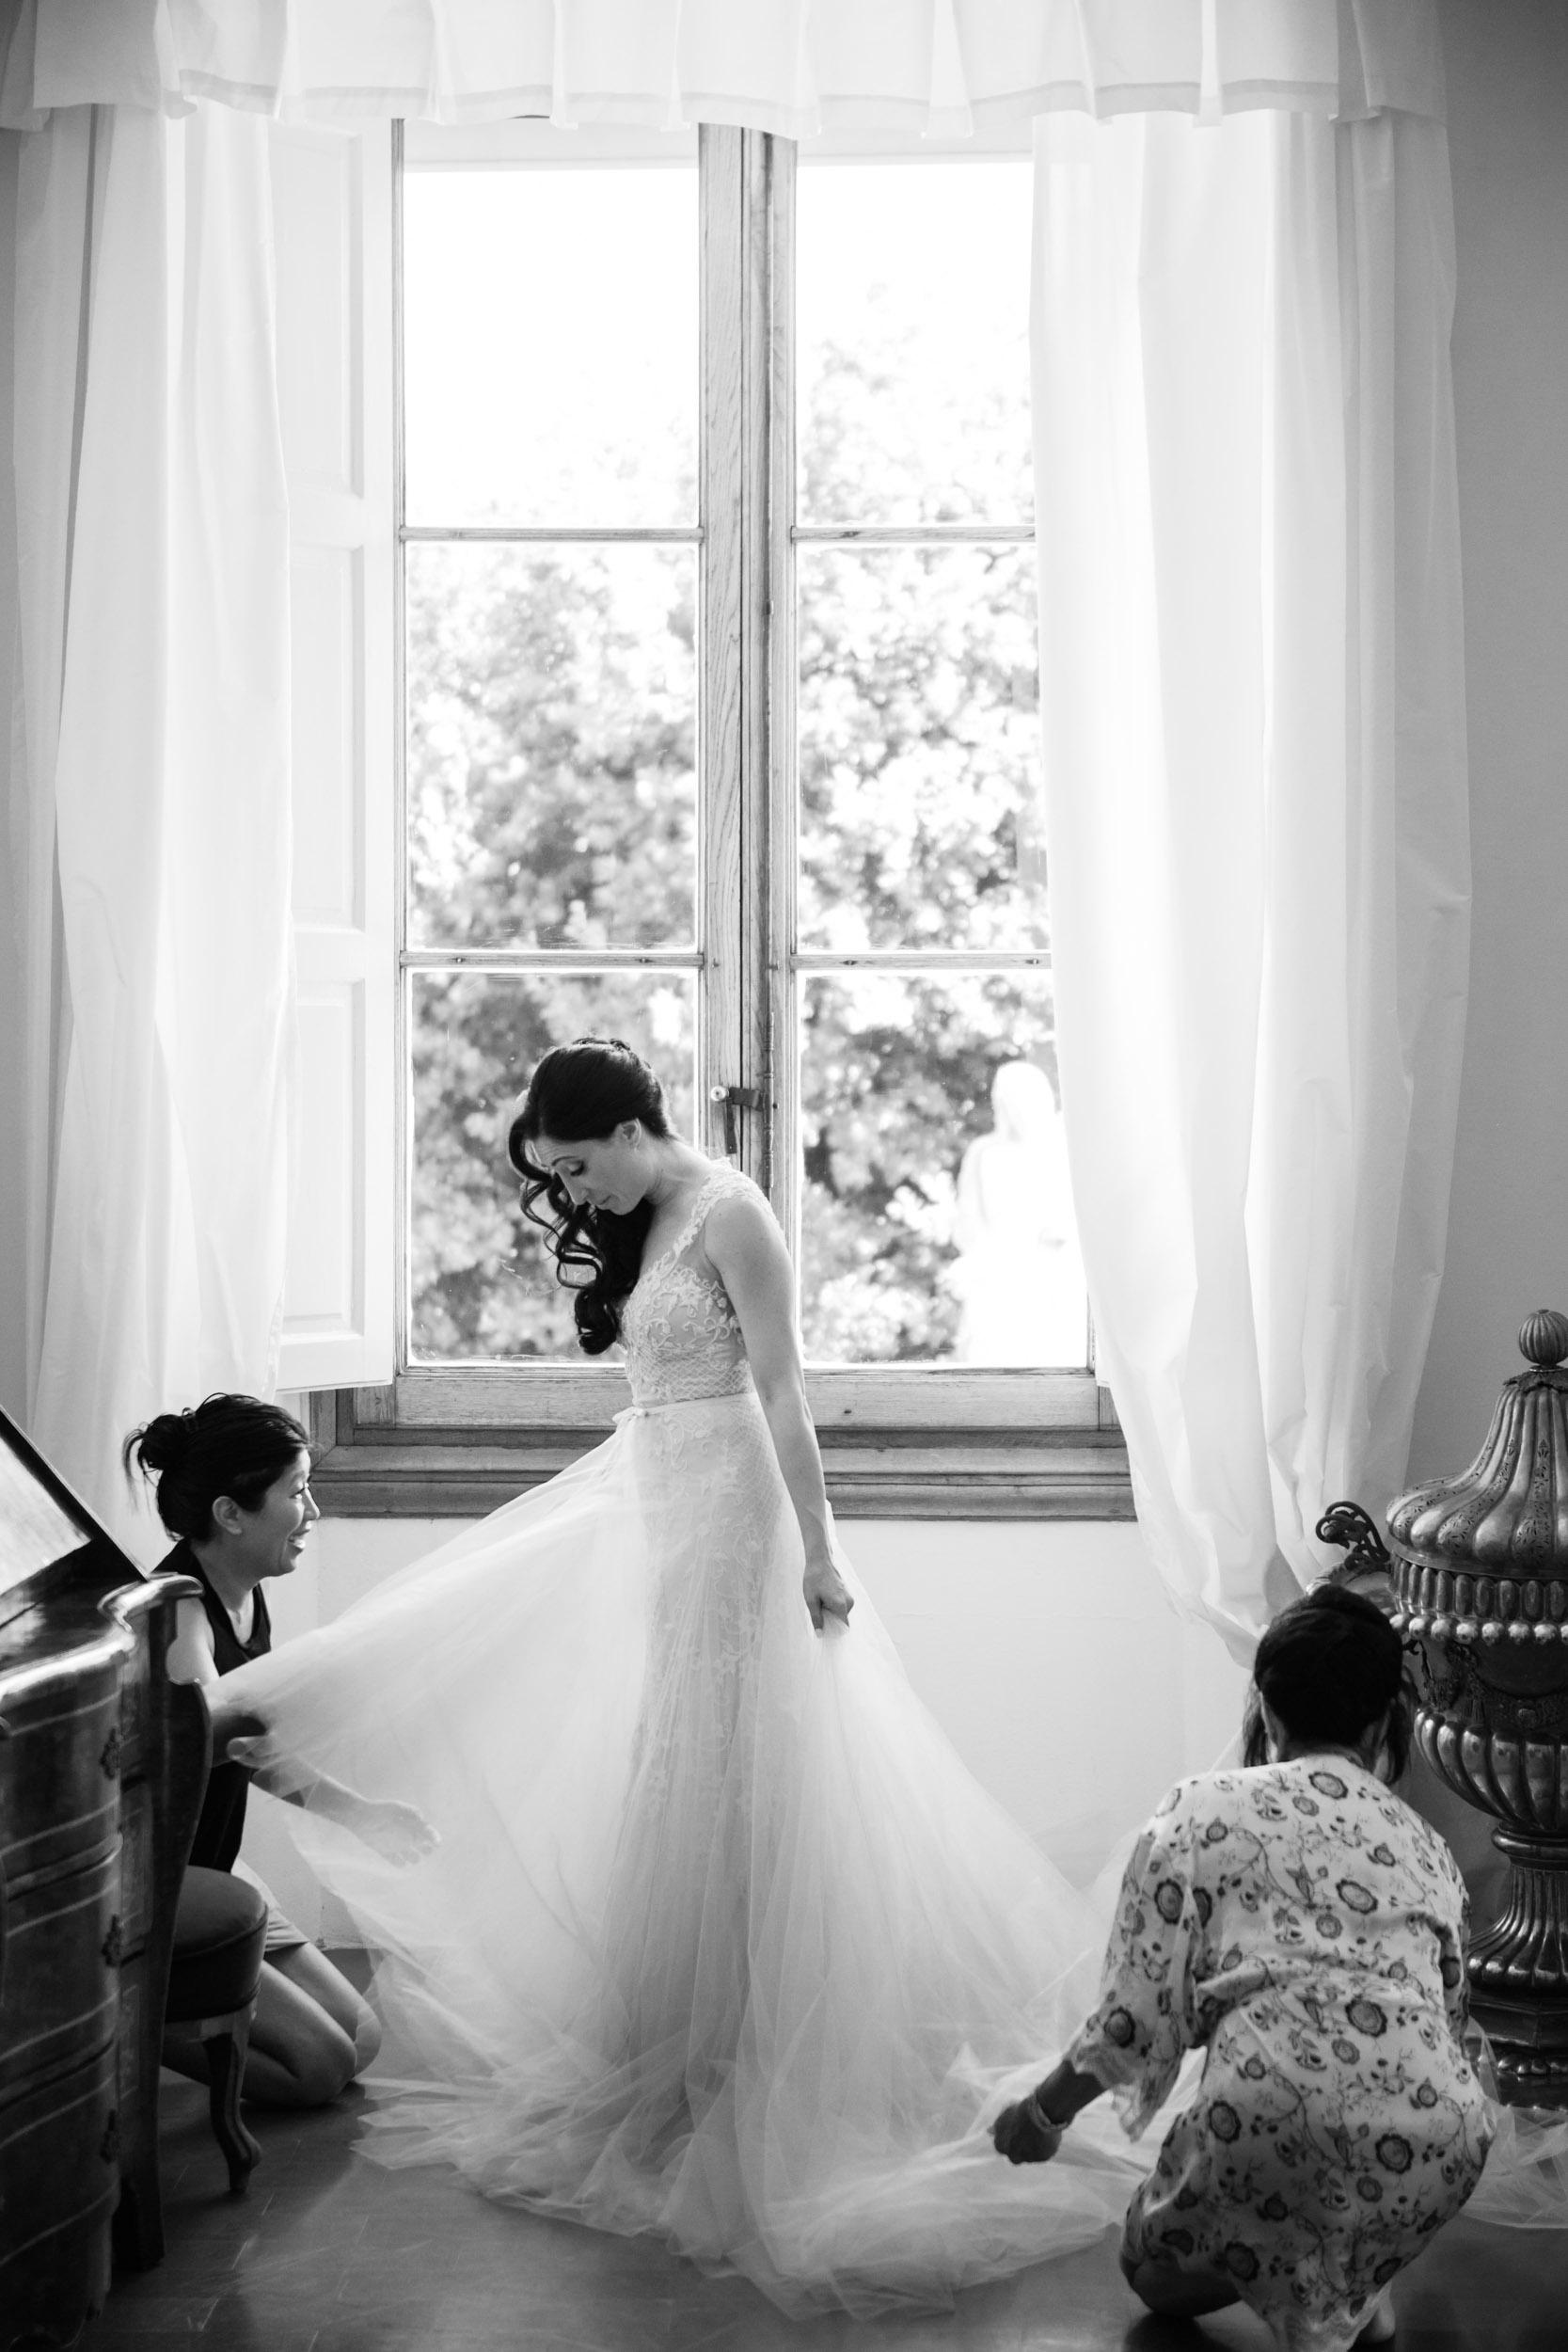 villa-gamberaia-florence-italy-destination-wedding-8.jpg